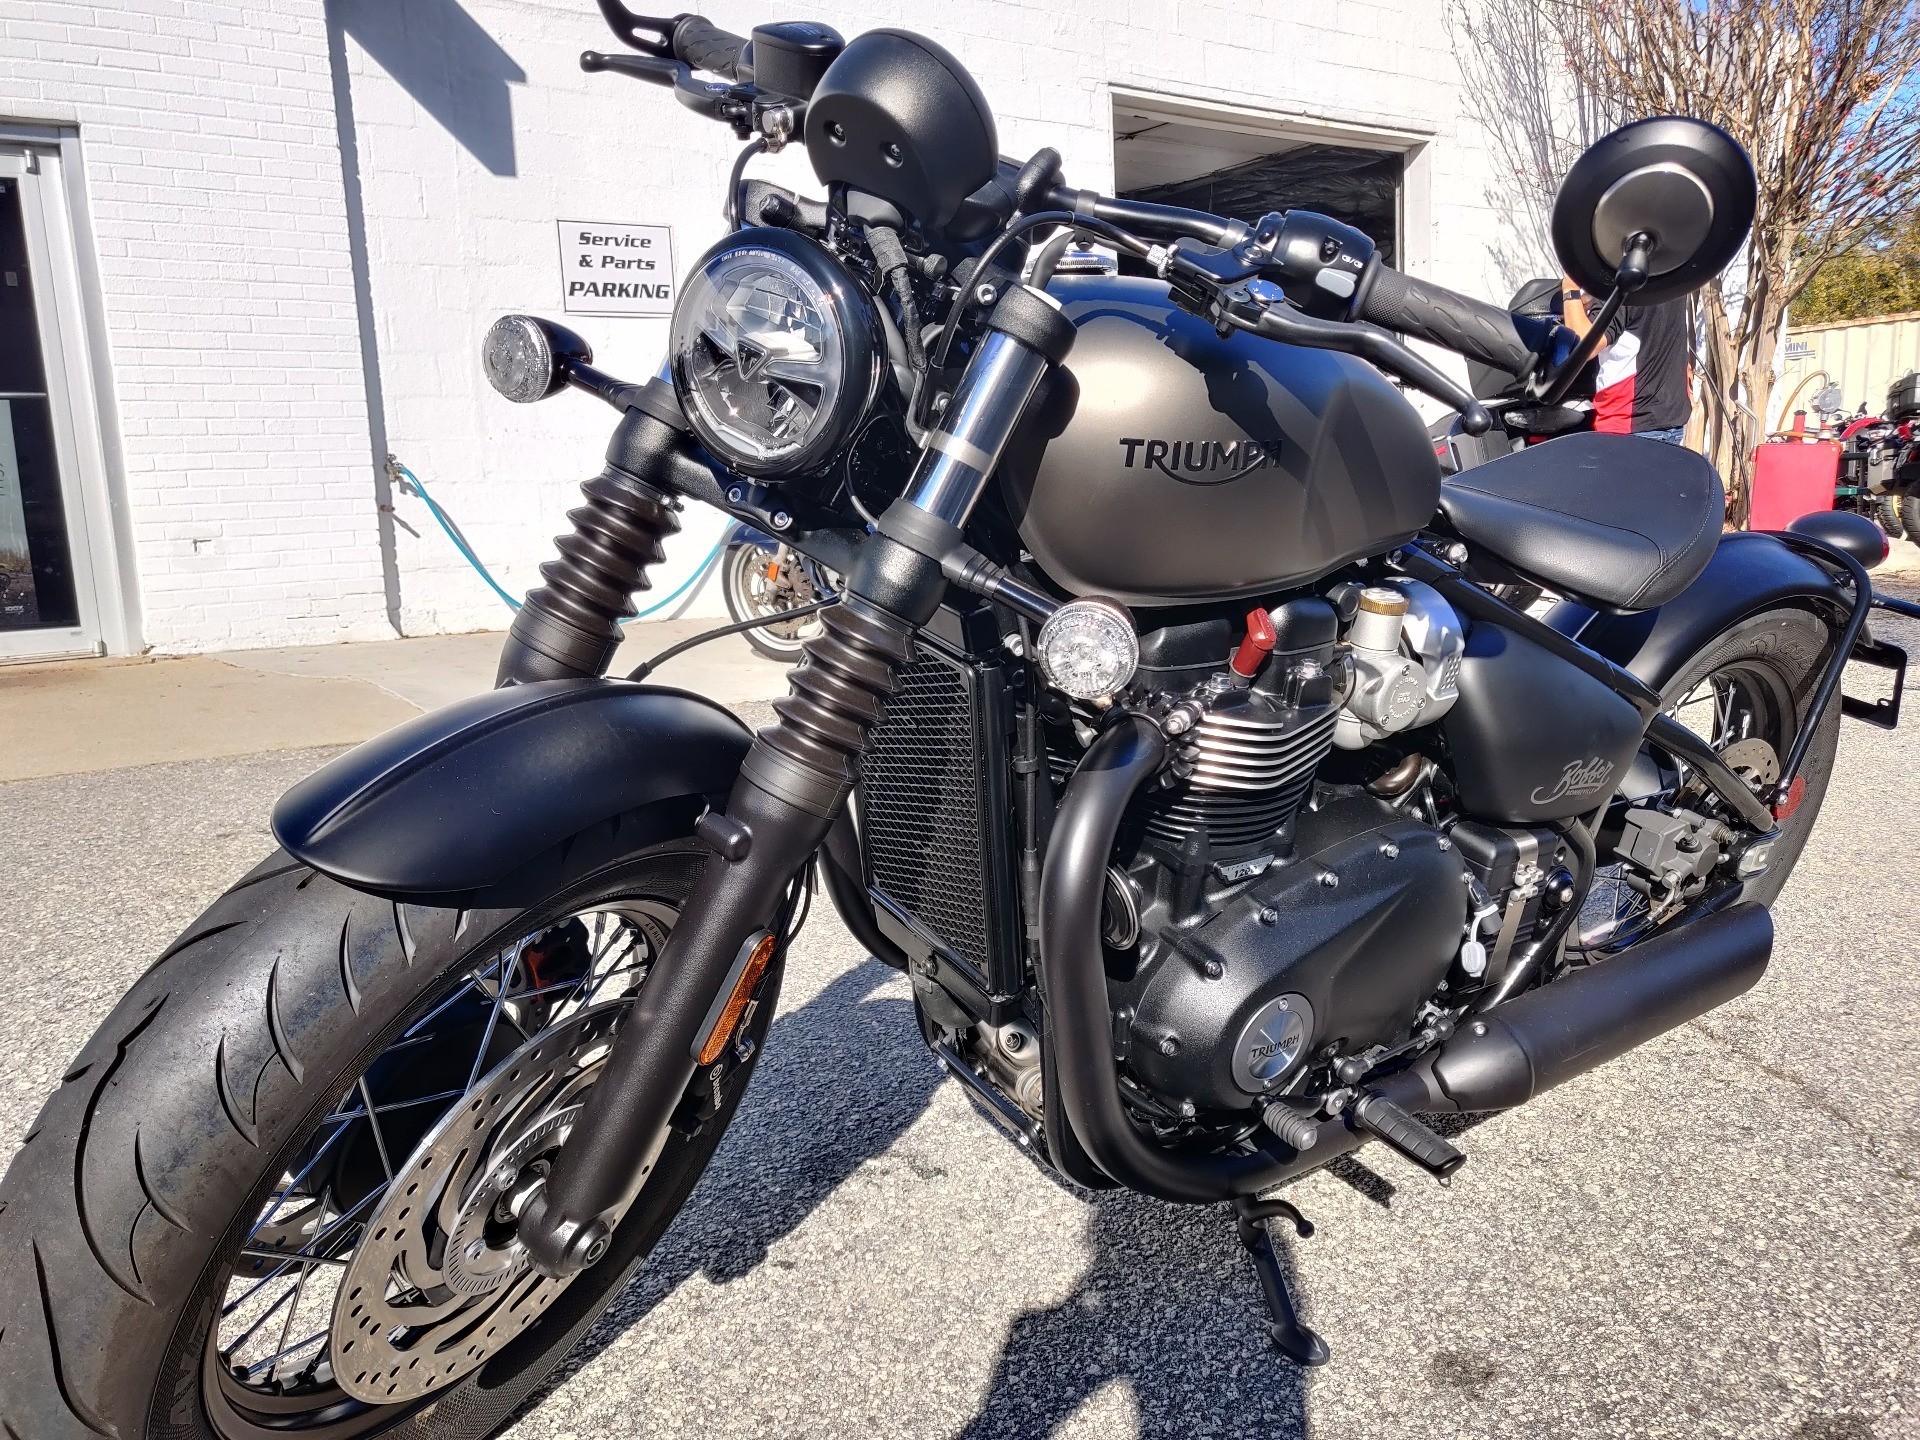 New 2020 Triumph Bonneville Bobber Black Matte Ironstone Motorcycles In Greenville Sc